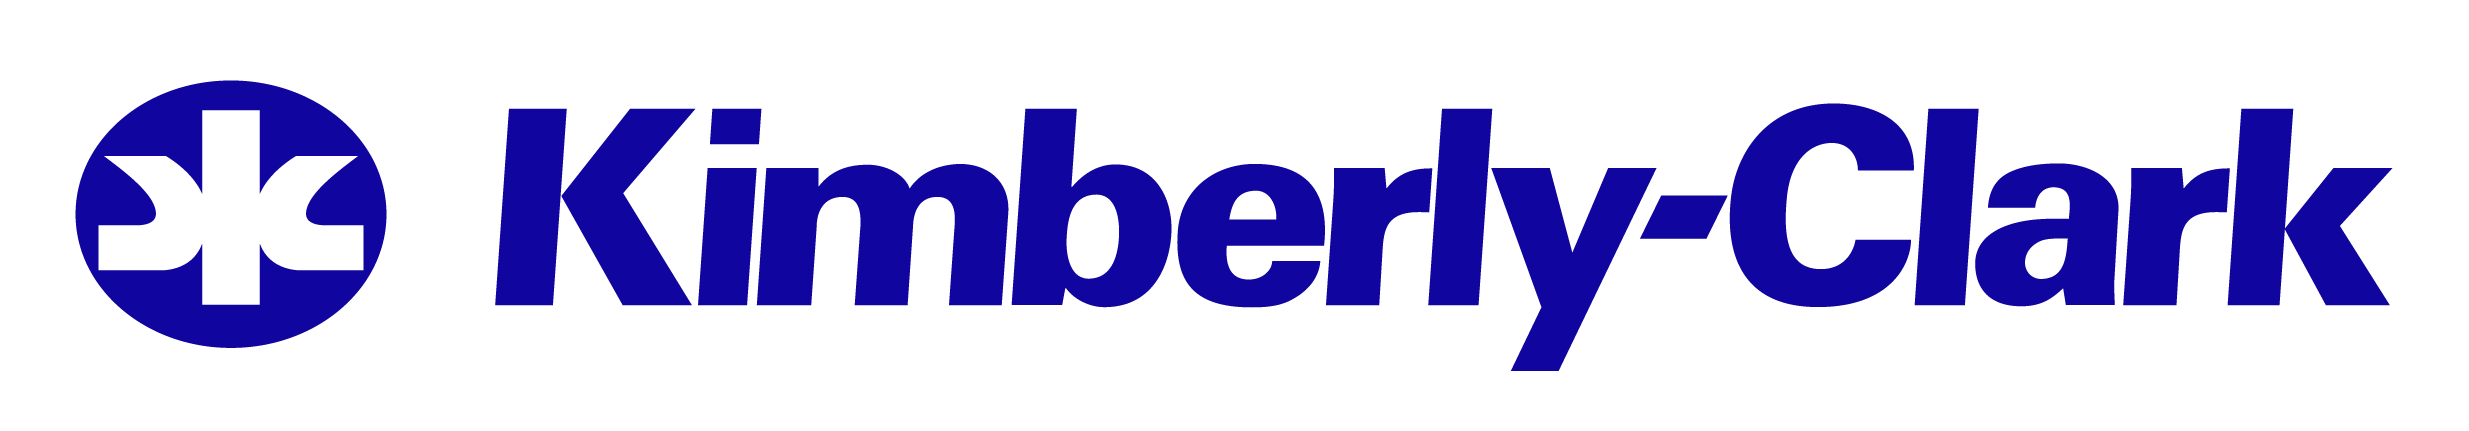 Image k c logo solid symbol rgb blue